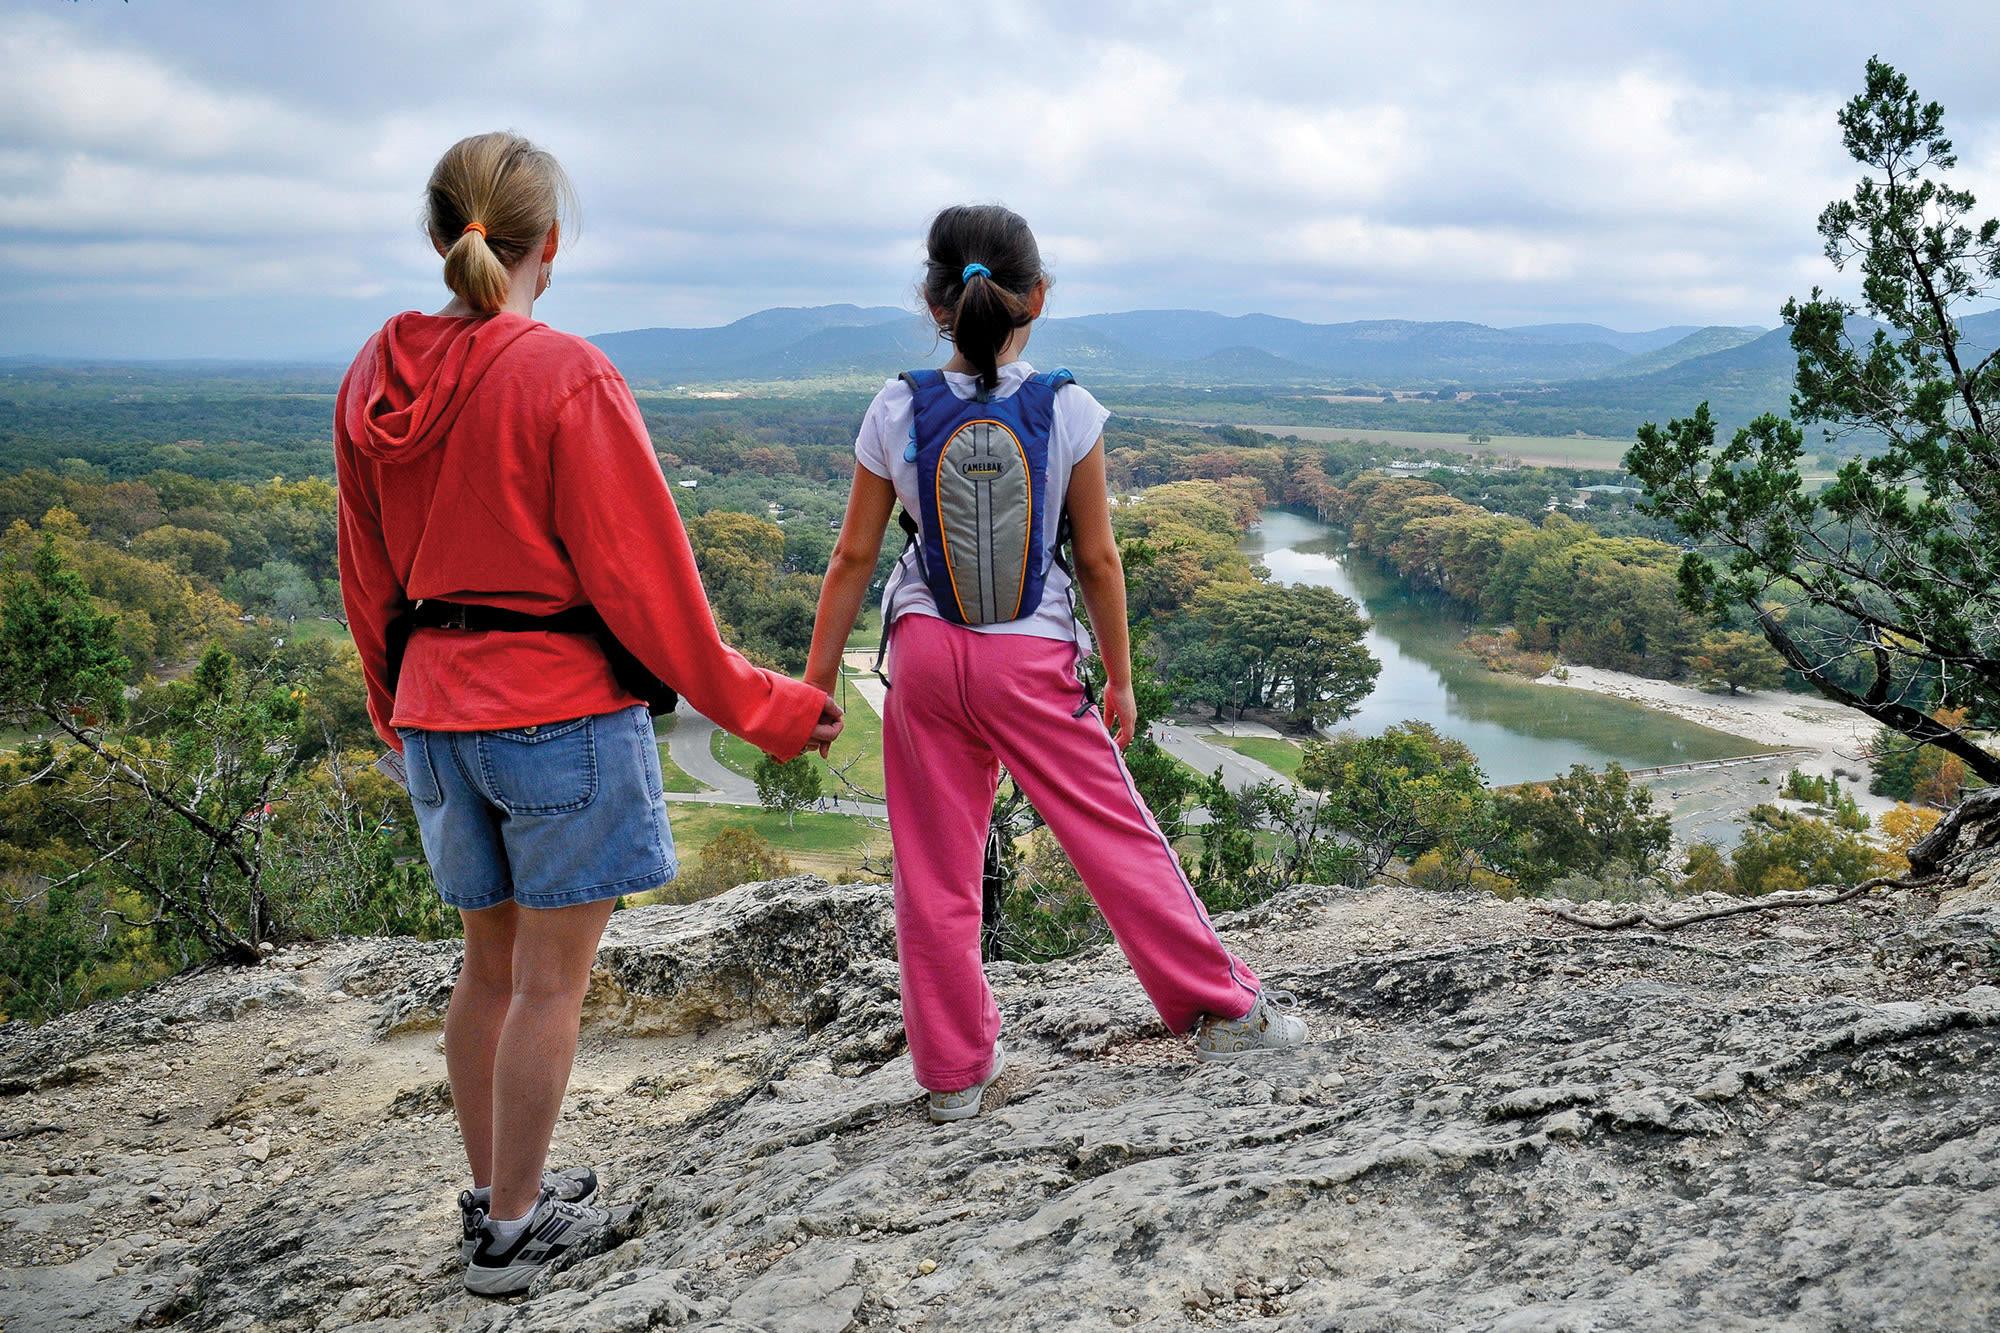 Garner hiking 3791 styjnr